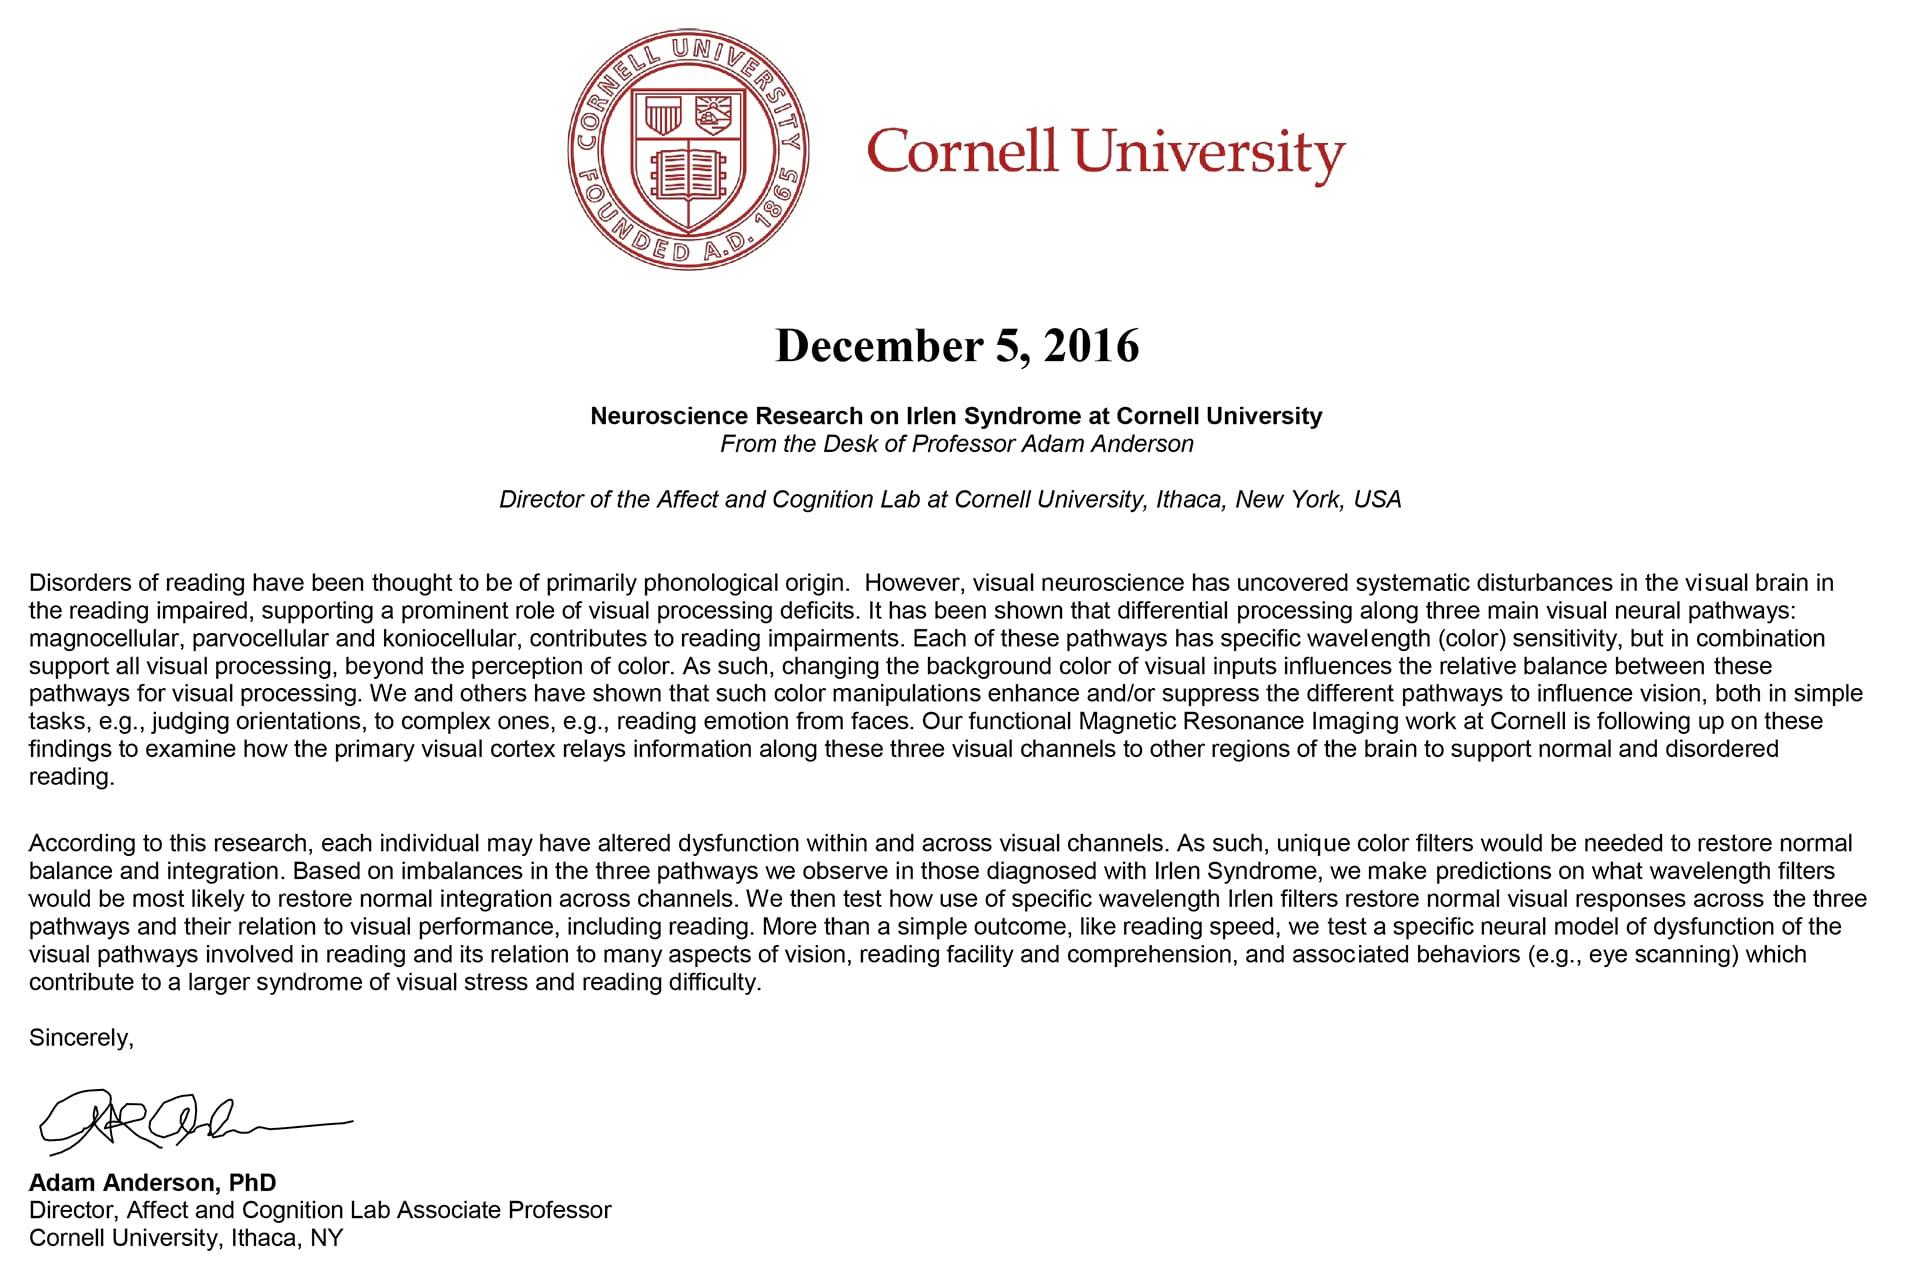 cornell university certificate